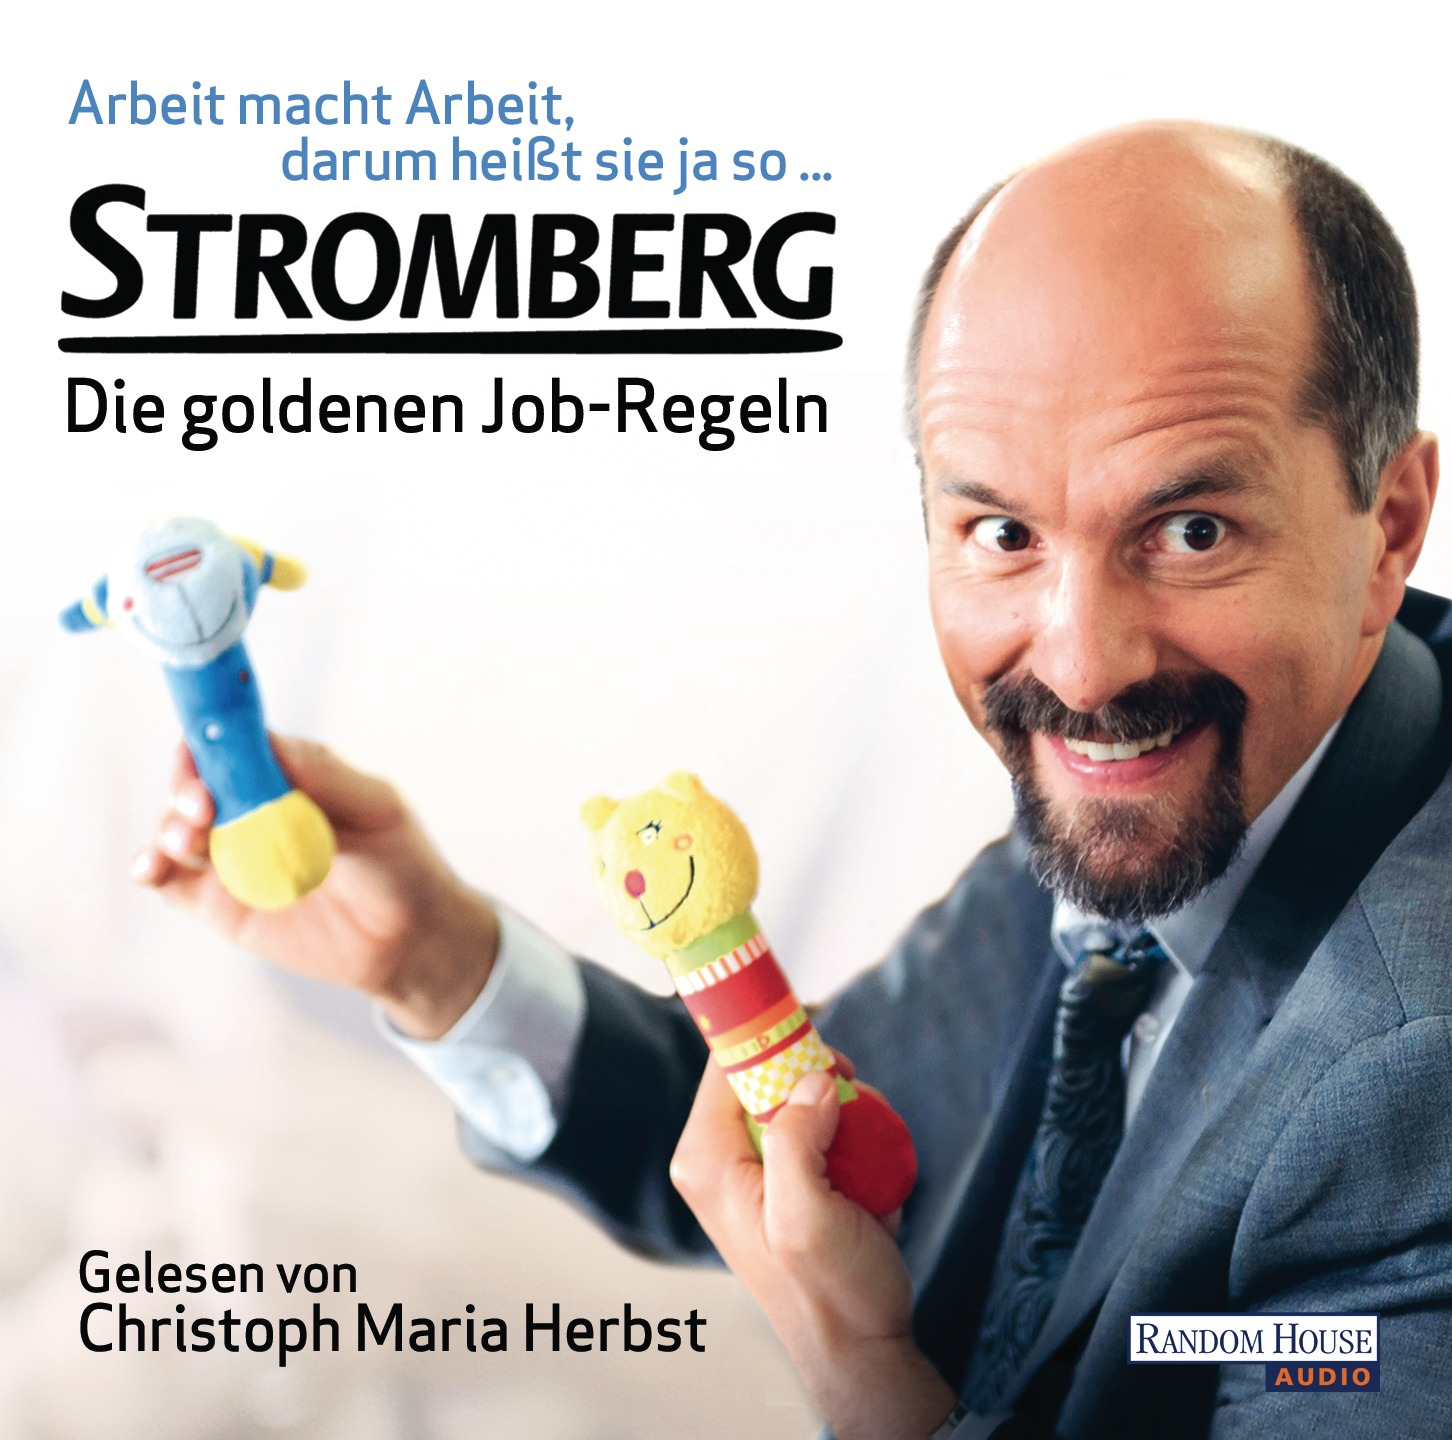 Stromberg - Die goldenen Job-Regeln: Arbeit mac...